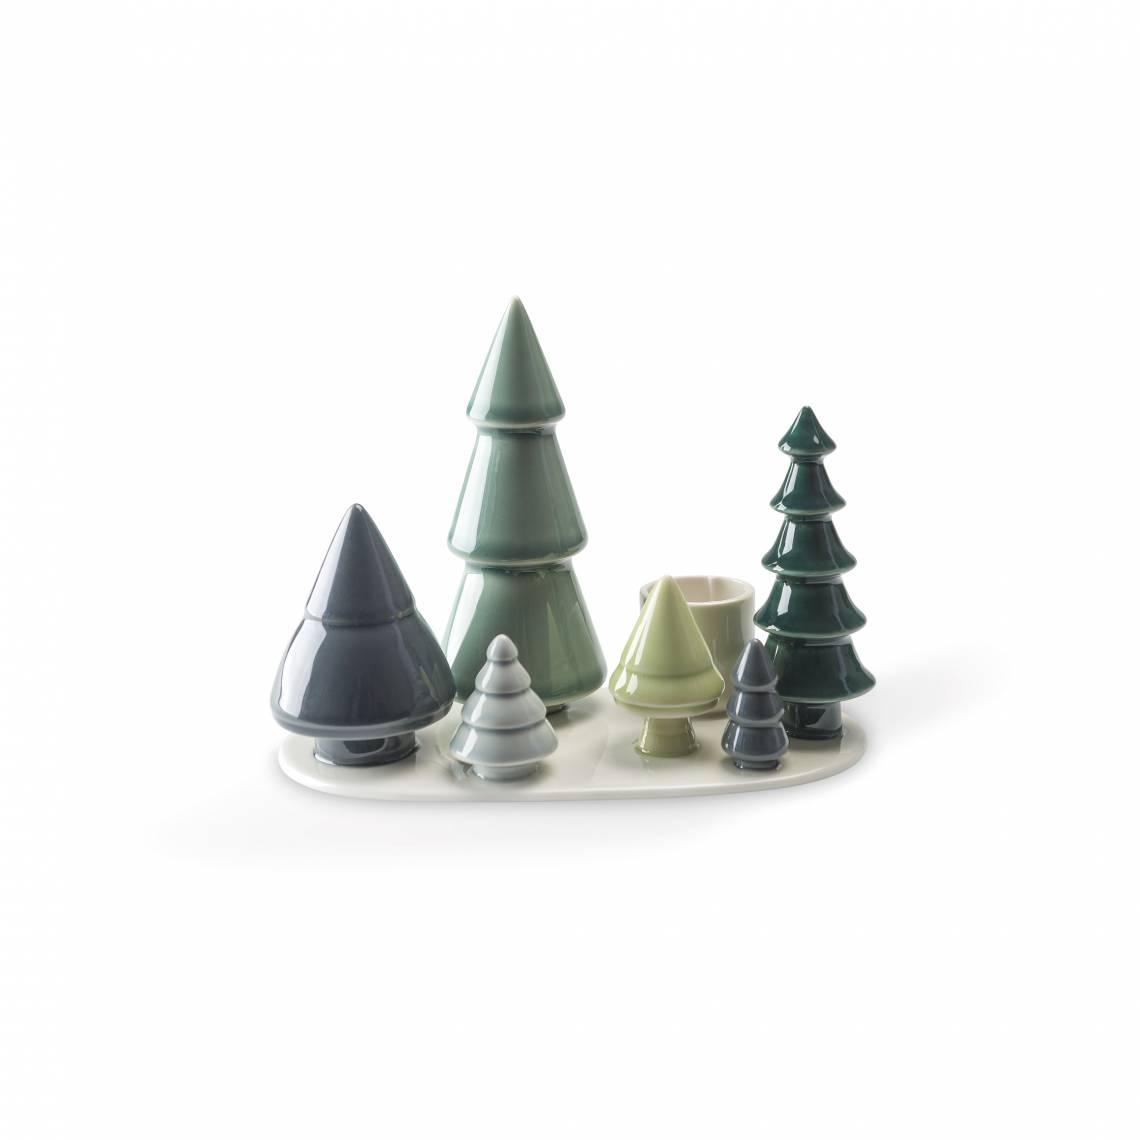 91170 - Forest  - Kerzenhalter Wintergeschichten Wald